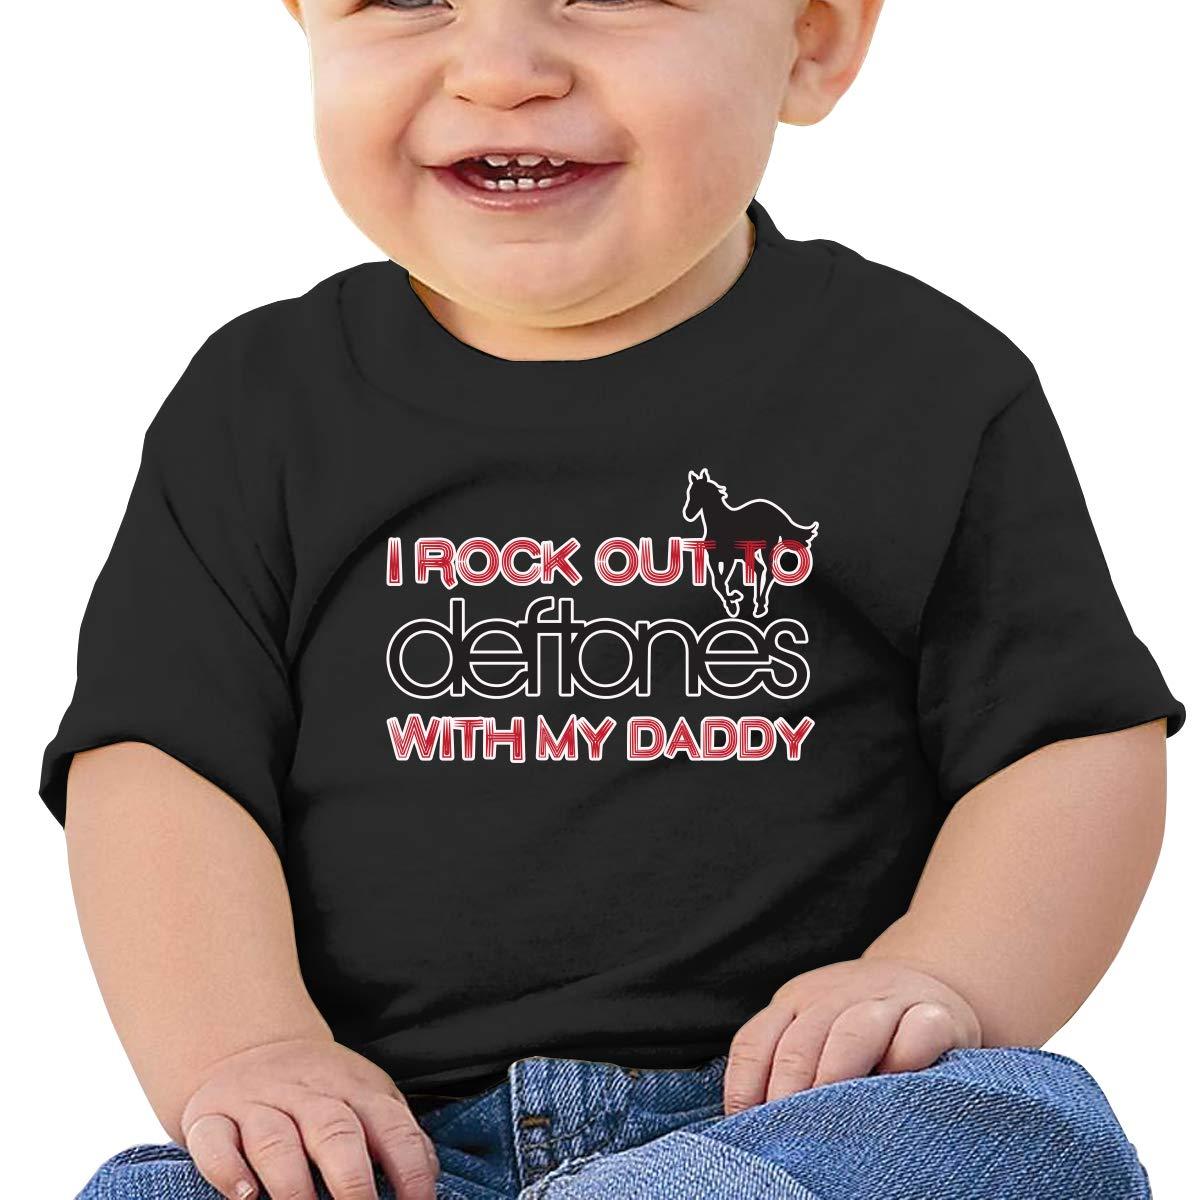 Rock Out Toddler Short-Sleeve Tee for Boy Girl Infant Kids T-Shirt On Newborn 6-18 Months